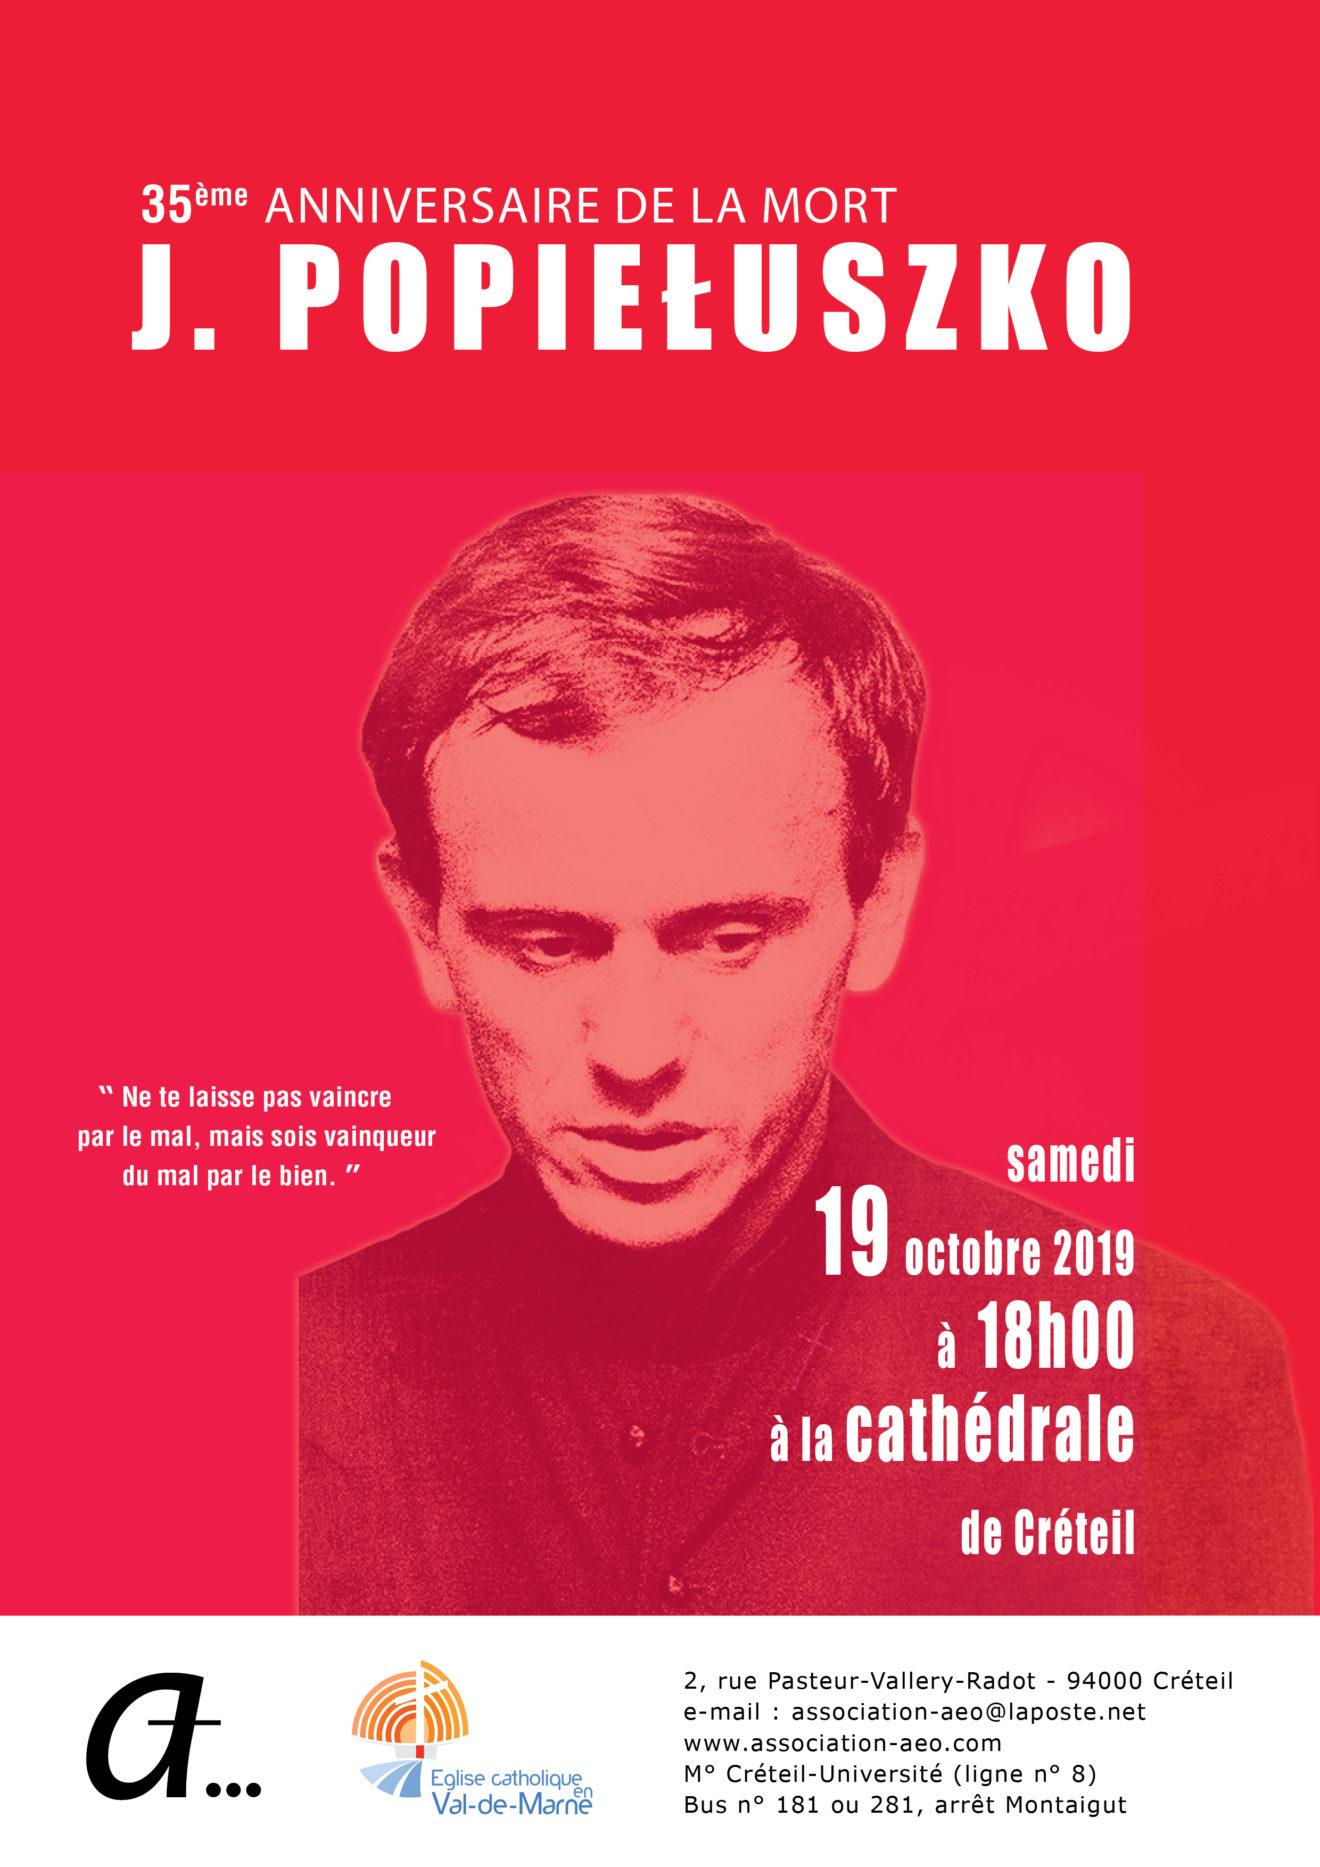 Messe anniversaire du bienheureux Jerzy Popieluszko